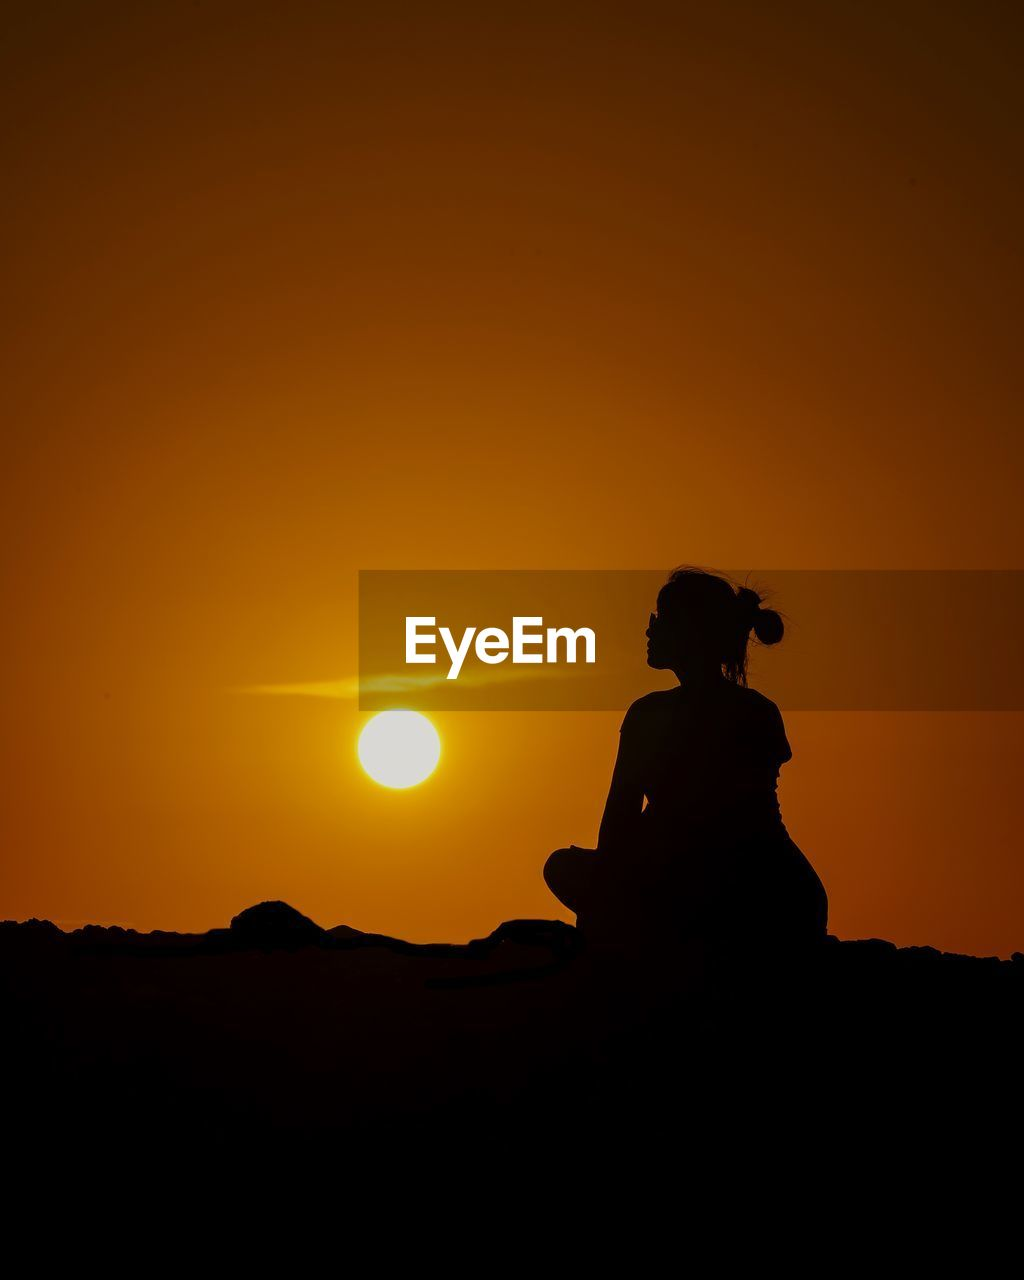 SILHOUETTE MAN SITTING AGAINST ORANGE SUNSET SKY